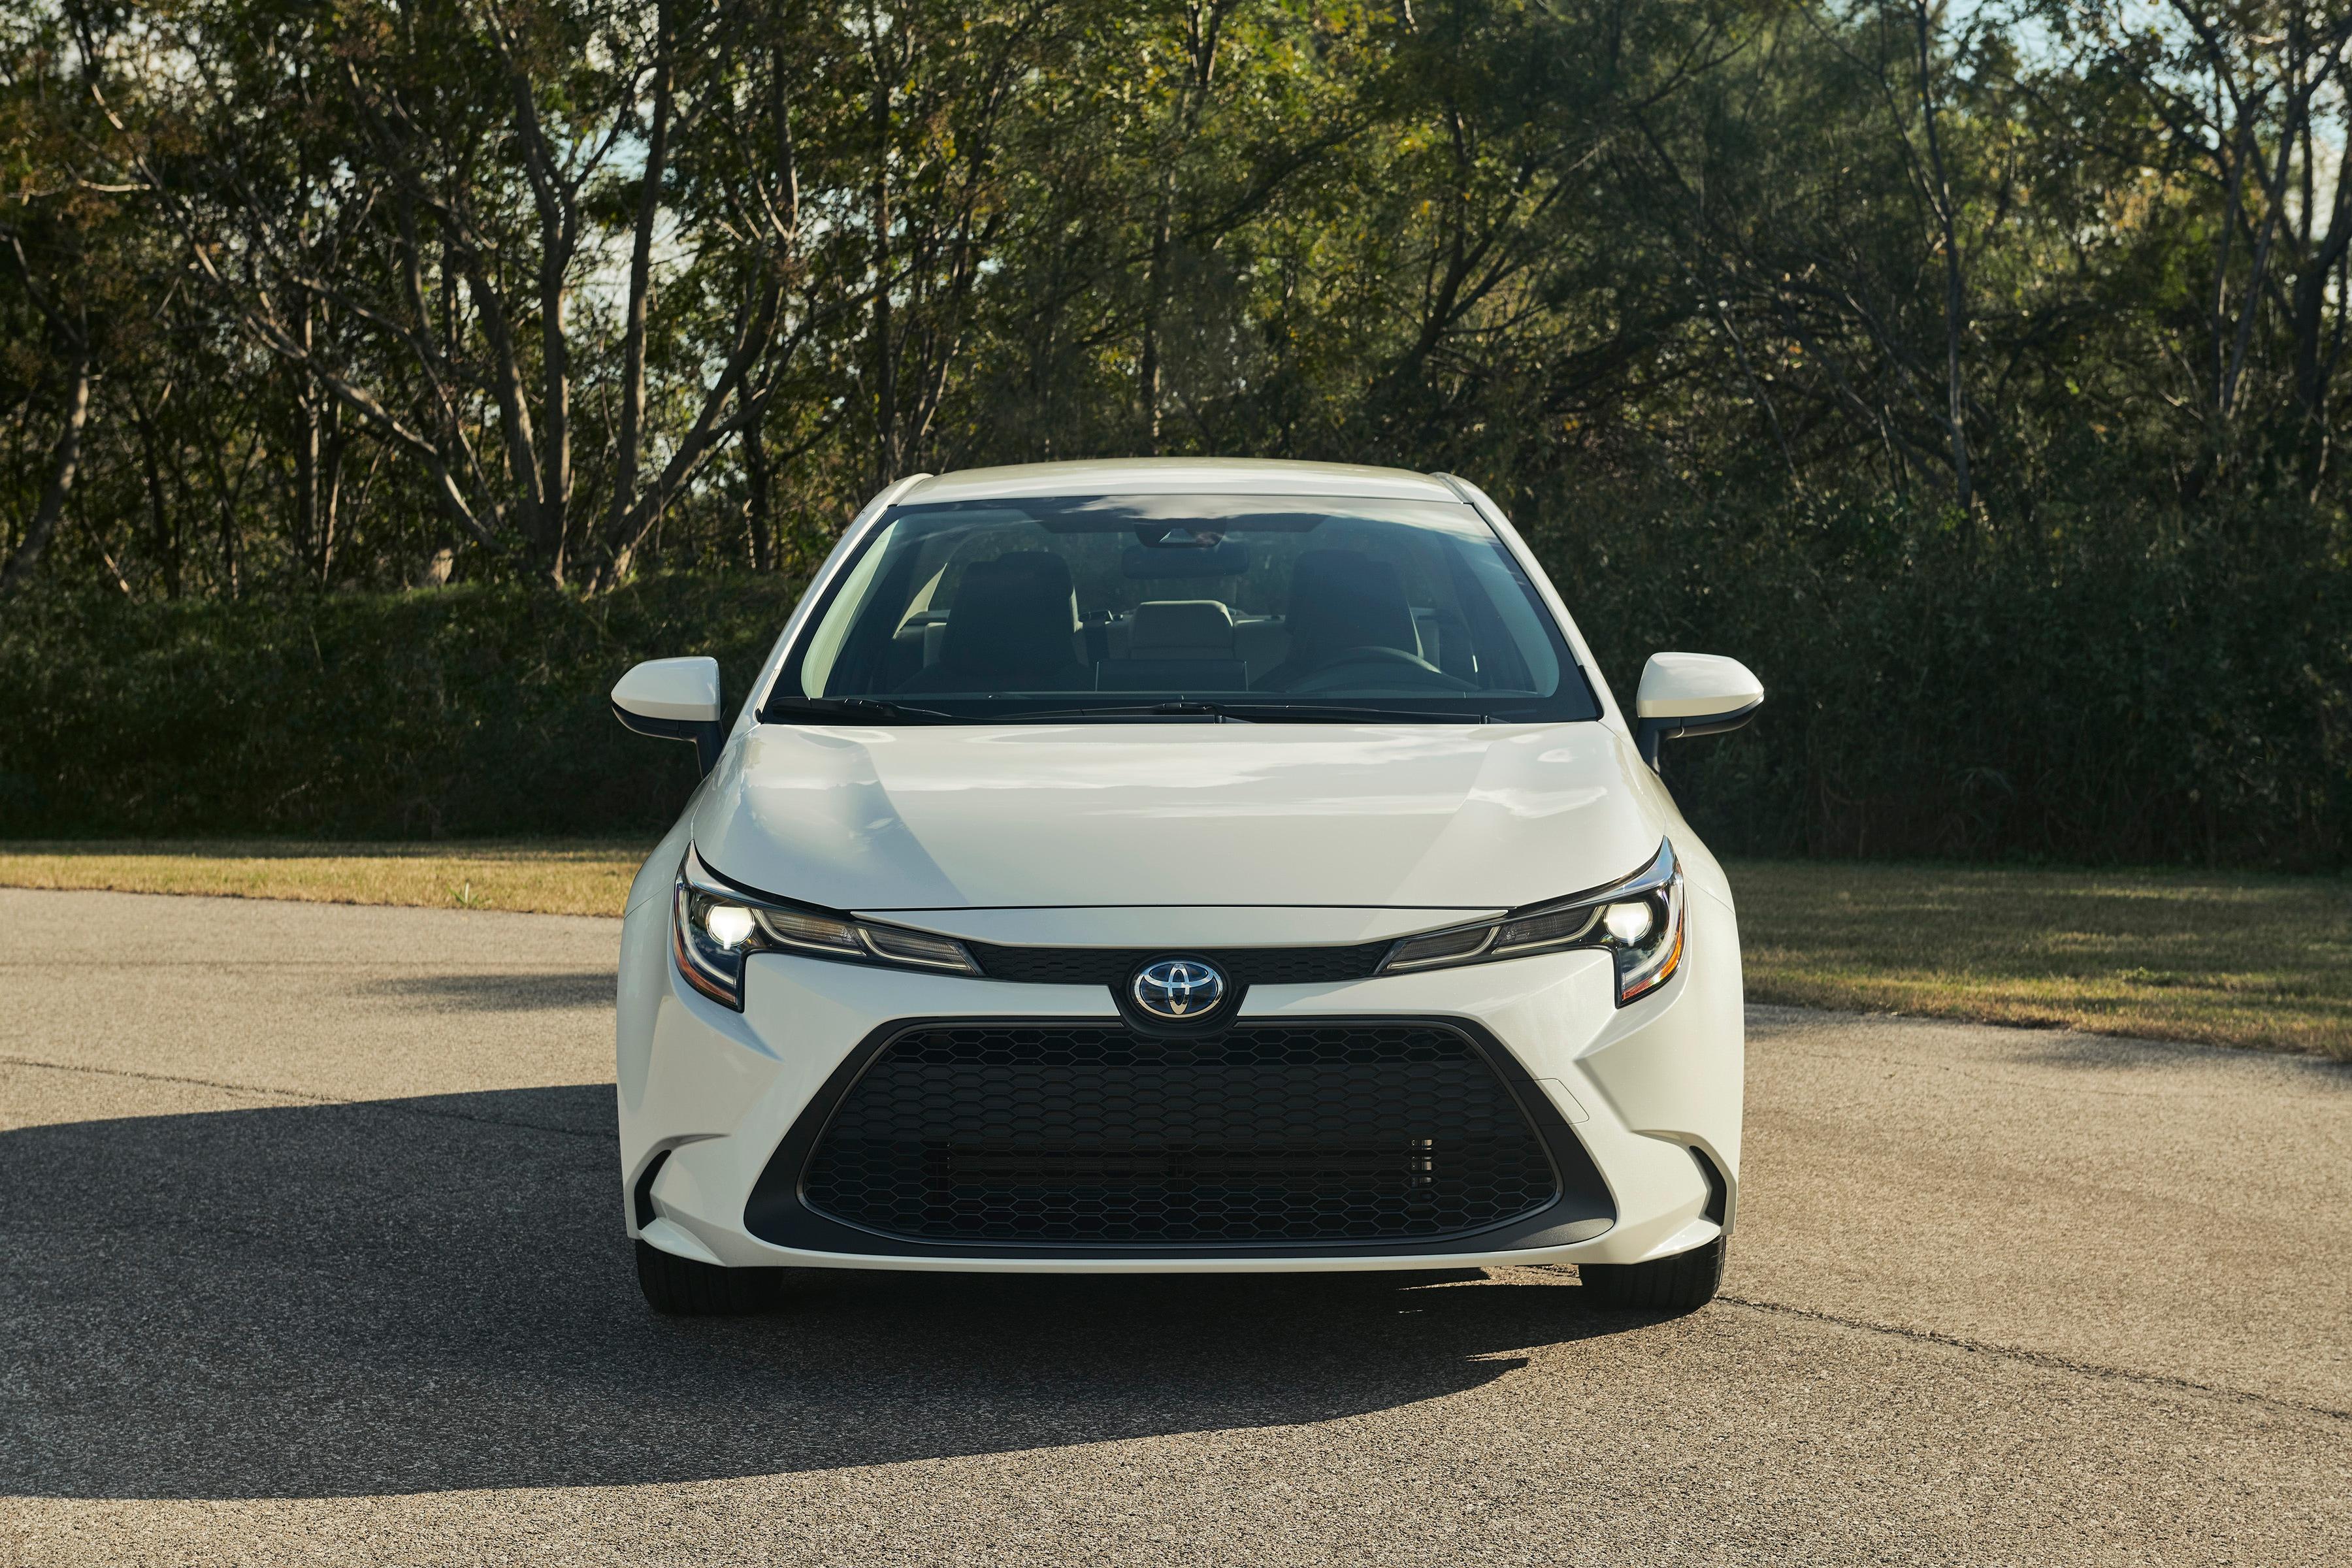 Best Headlamp 2020 2020 Toyota Corolla Gets First Hybrid Model|Little Rock,AR